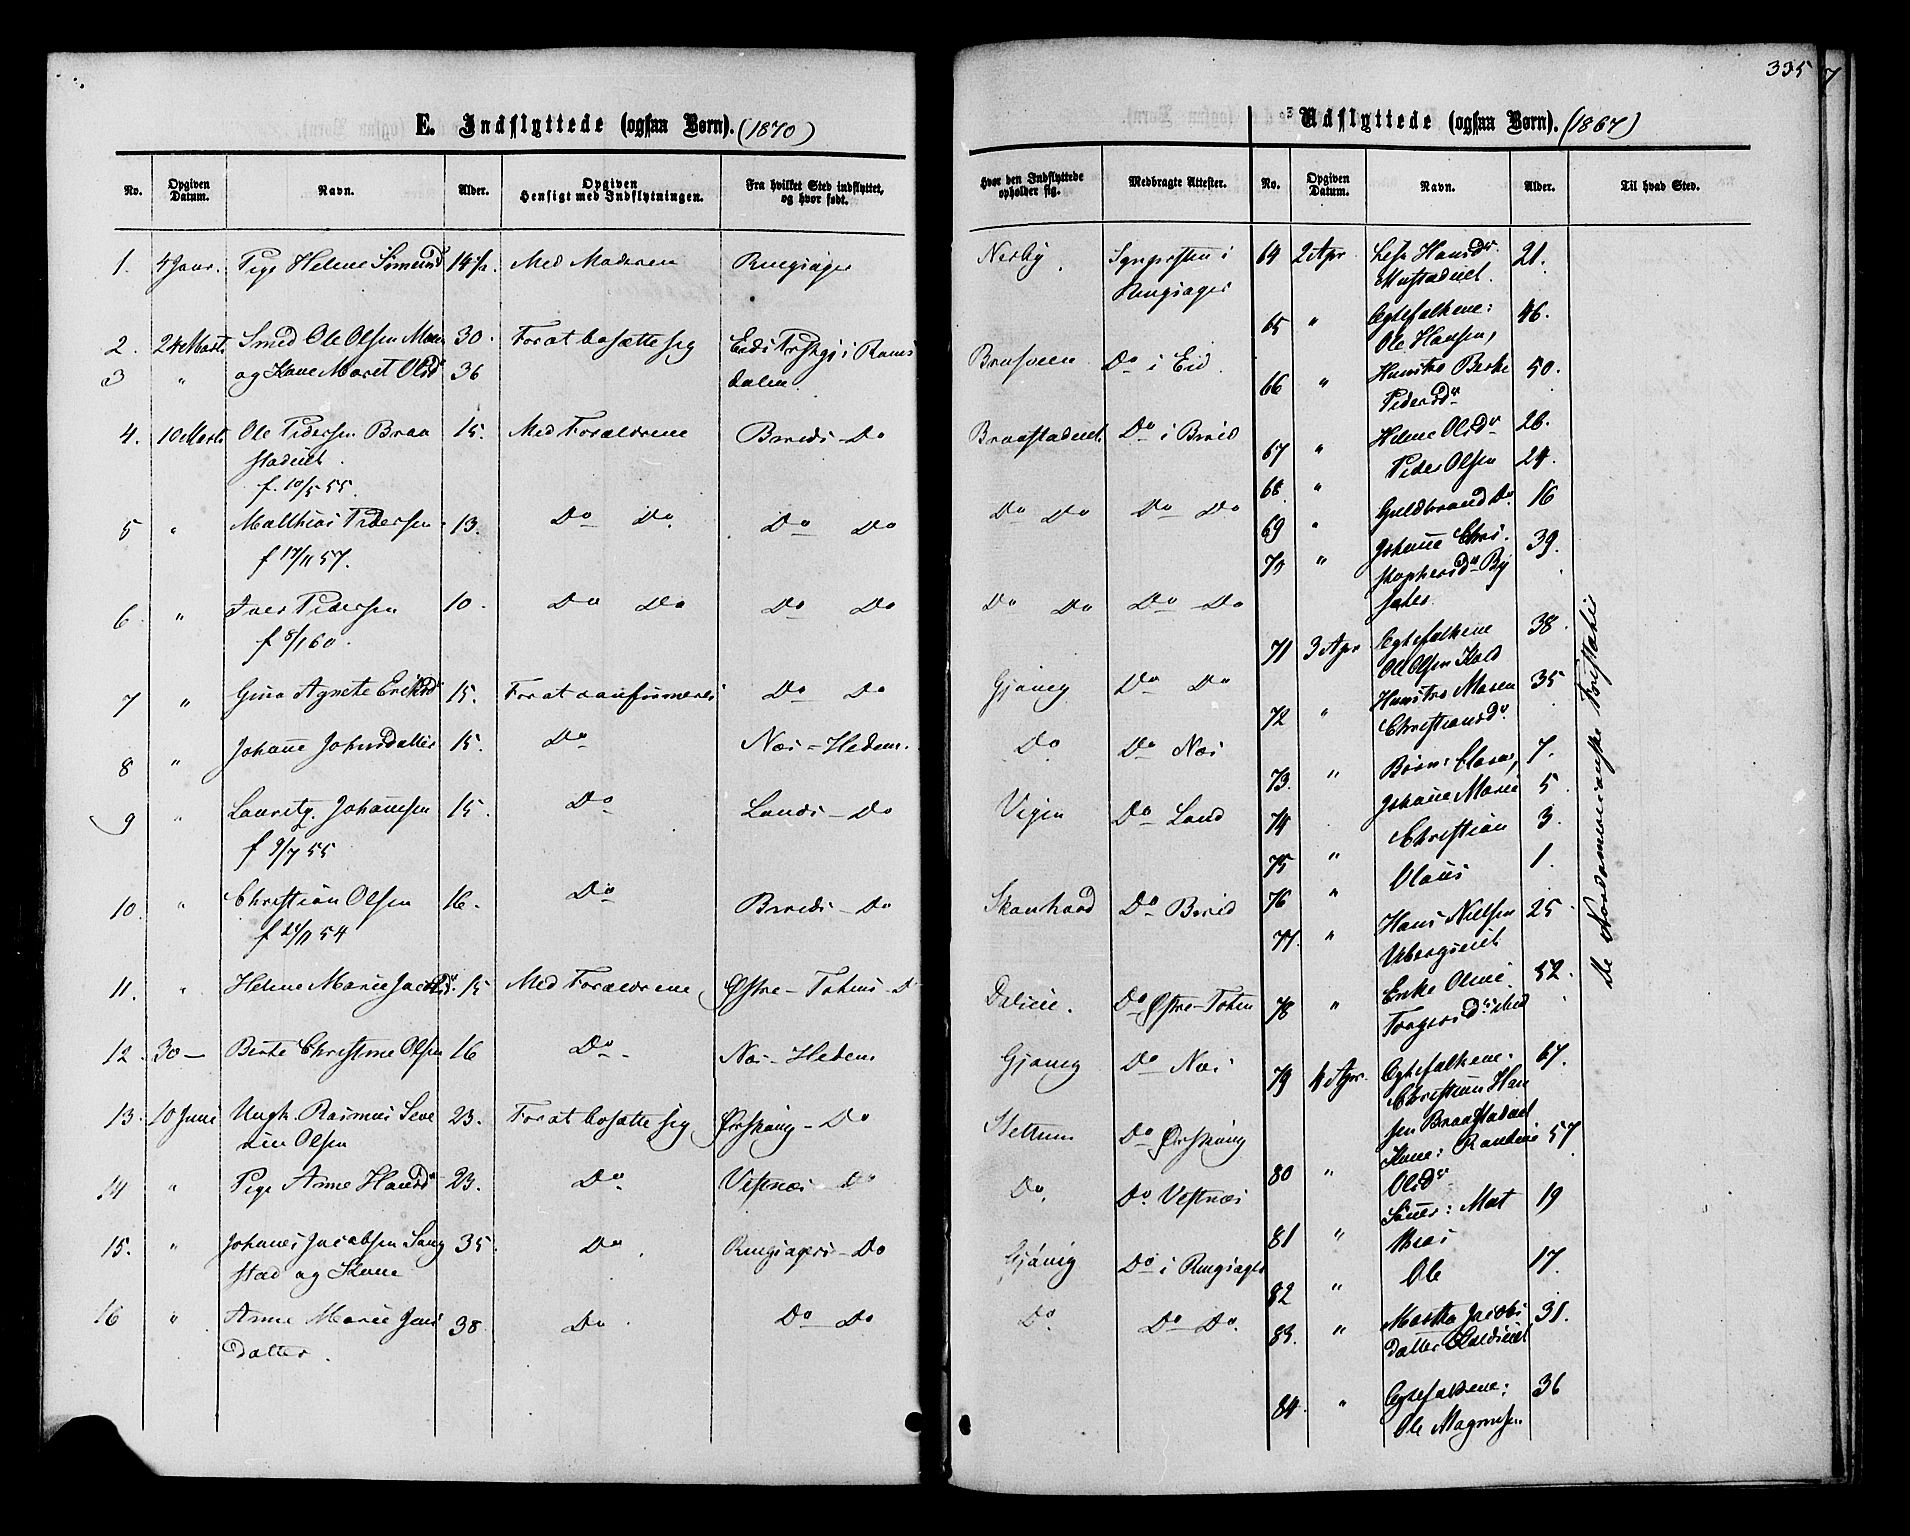 SAH, Vardal prestekontor, H/Ha/Haa/L0007: Ministerialbok nr. 7, 1867-1878, s. 335